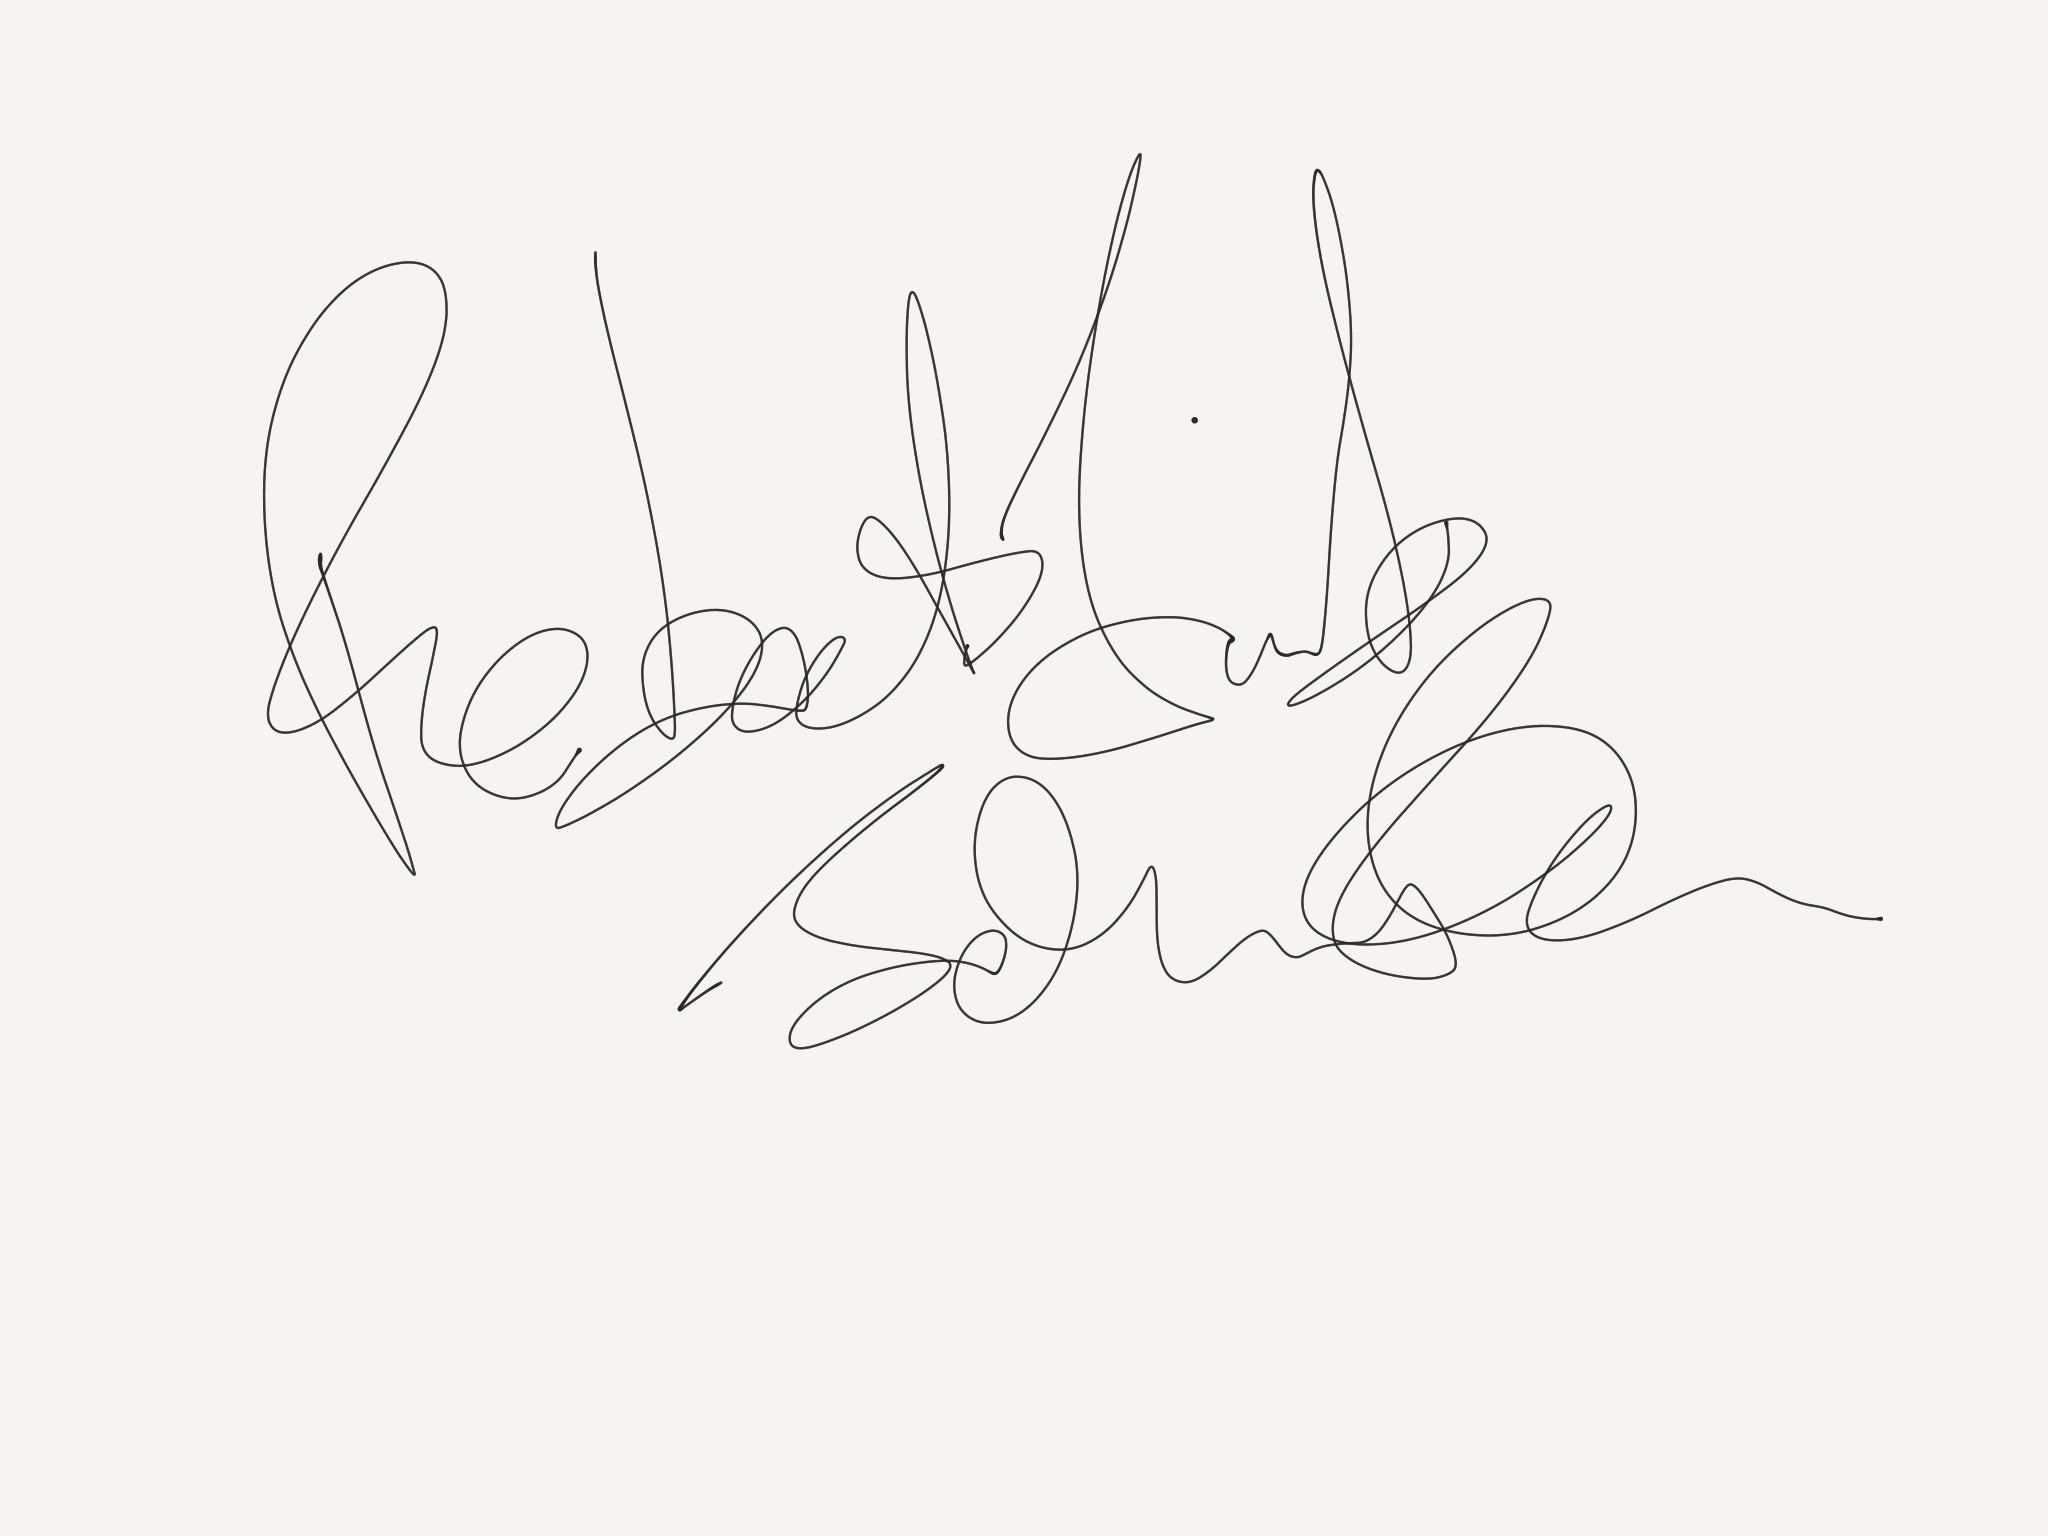 Robert Trick Johnston's Signature